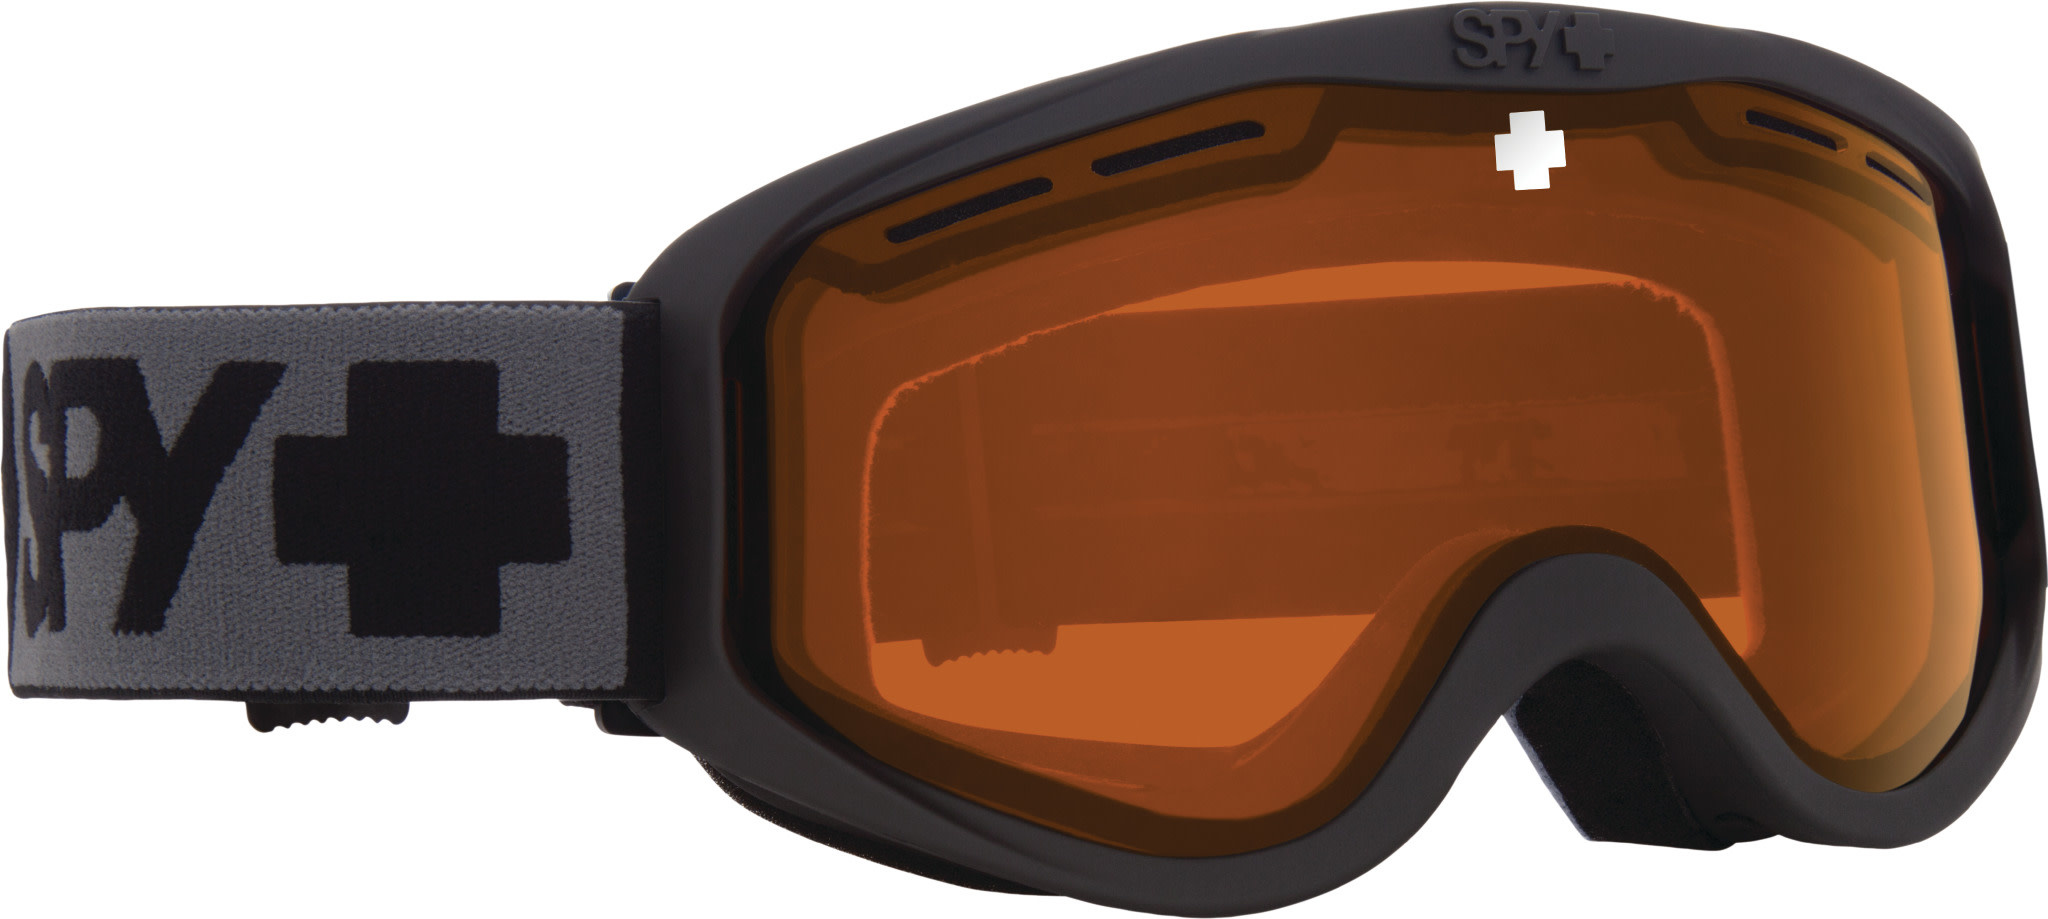 SPY Spy Youth Cadet Snow Goggle